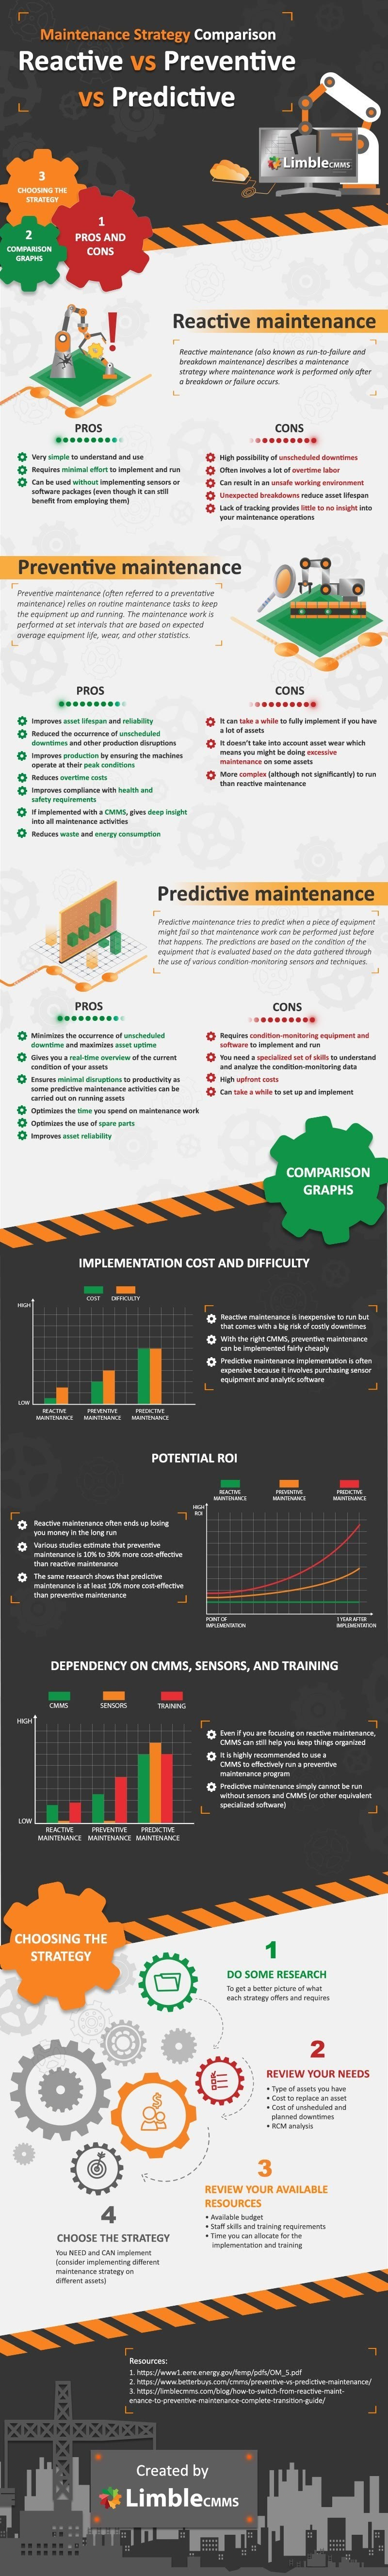 3 Main Types Of Maintenance Strategies Reactive vs Preventive vs Predictive #infographic